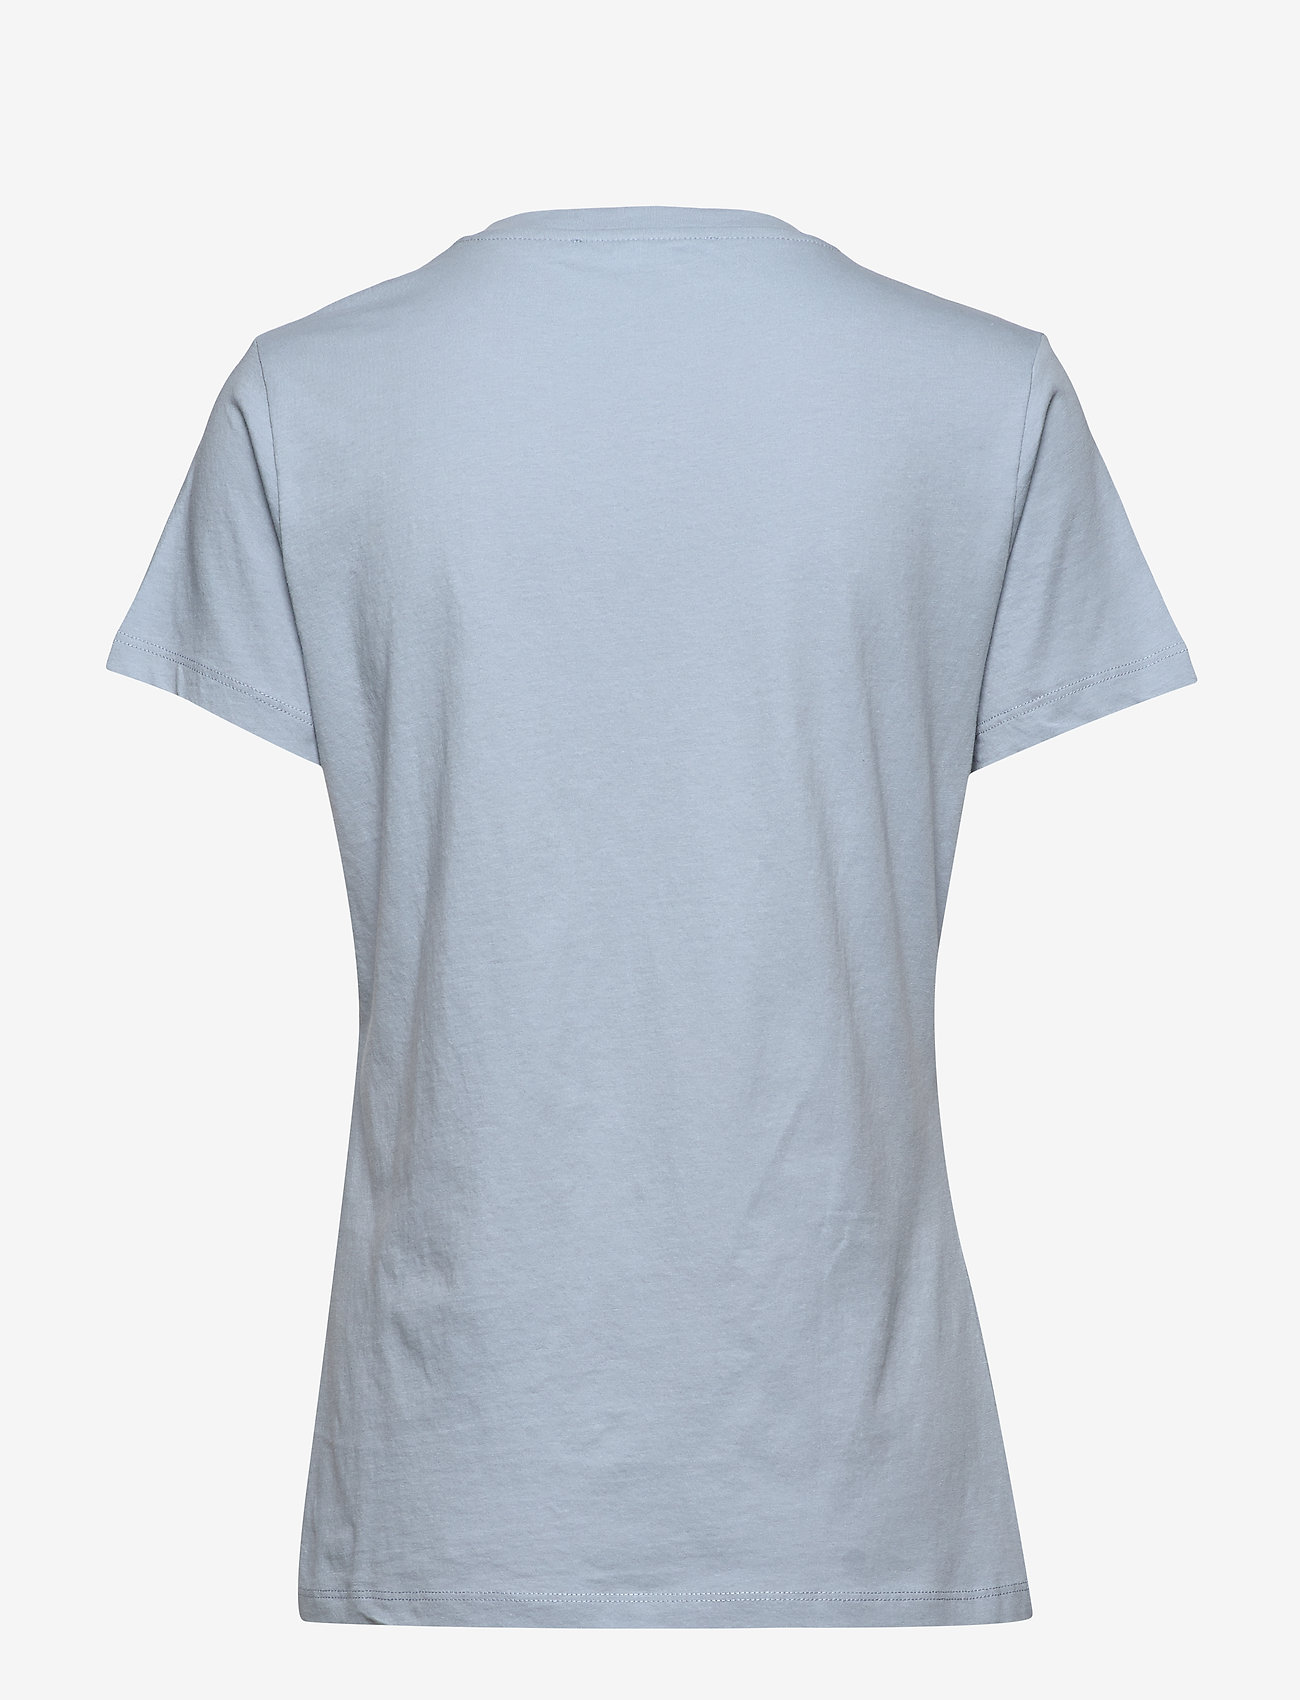 Samsøe Samsøe - Solly tee solid 205 - t-shirts - dusty blue - 1